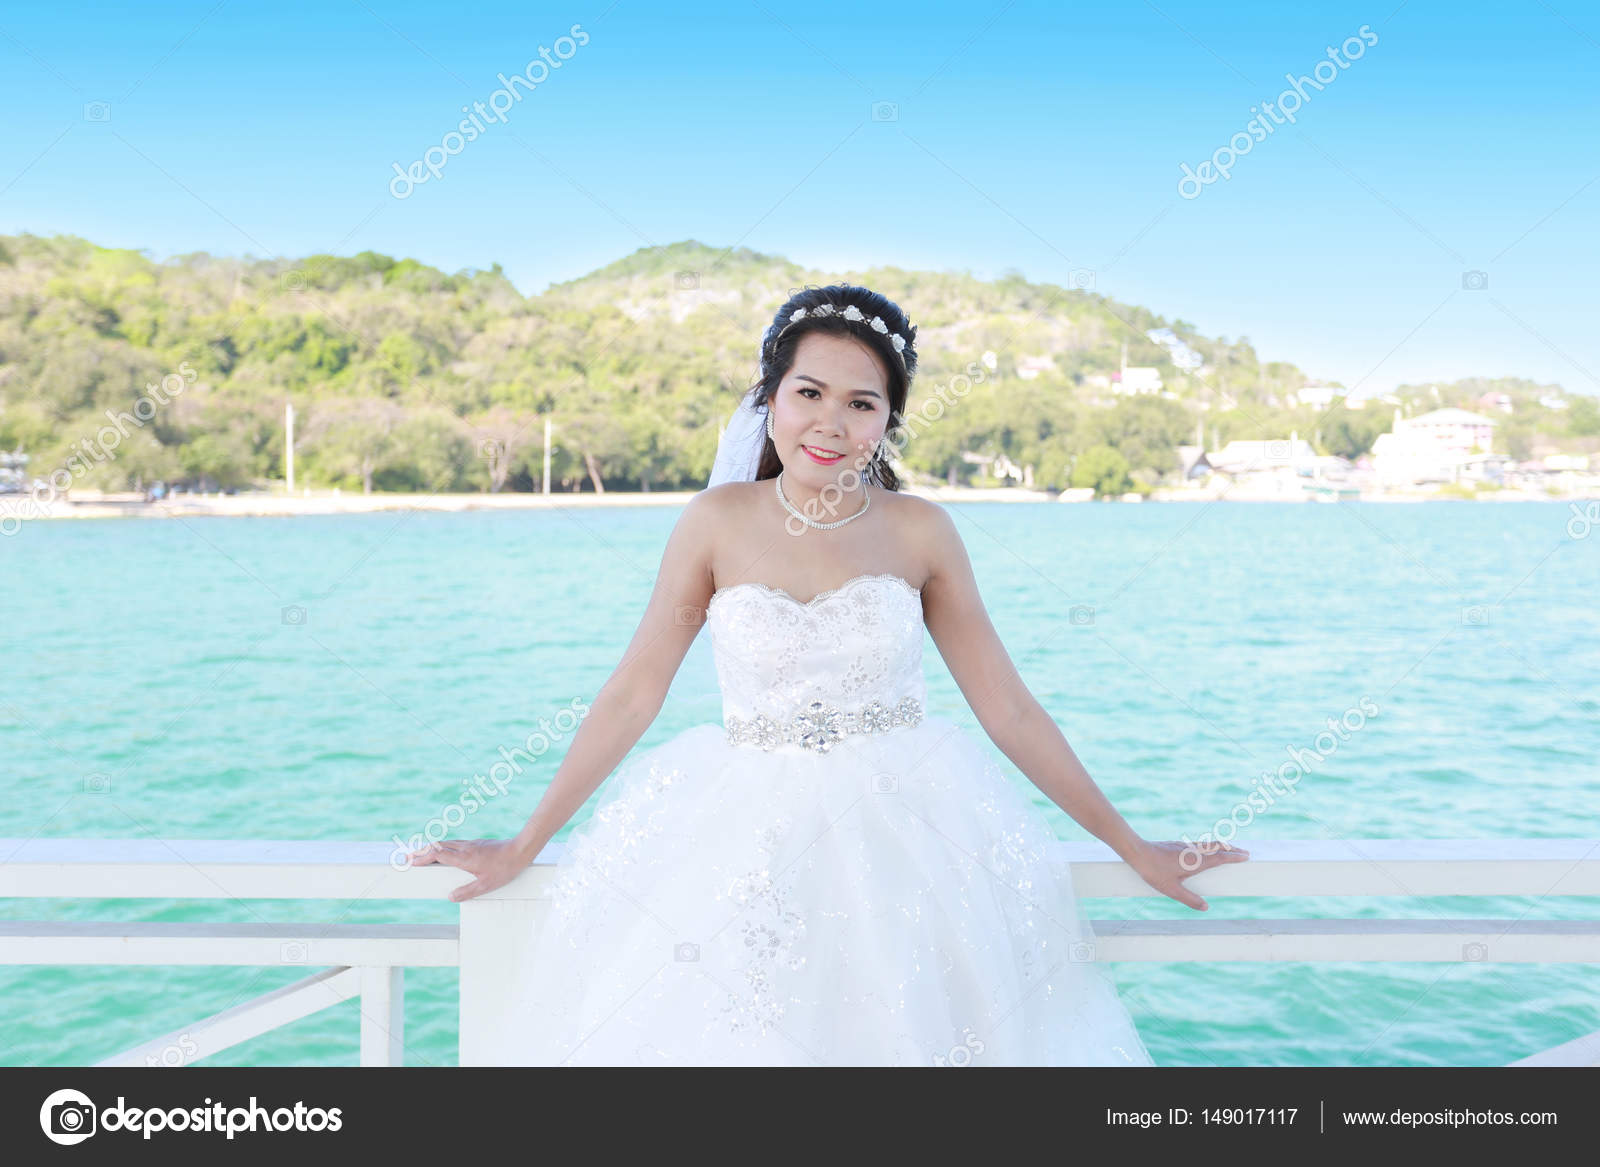 Asiáticas Fotos FotosmujeresVestido Novia Mujeres Chang Moda Isla oQeWCdxrB